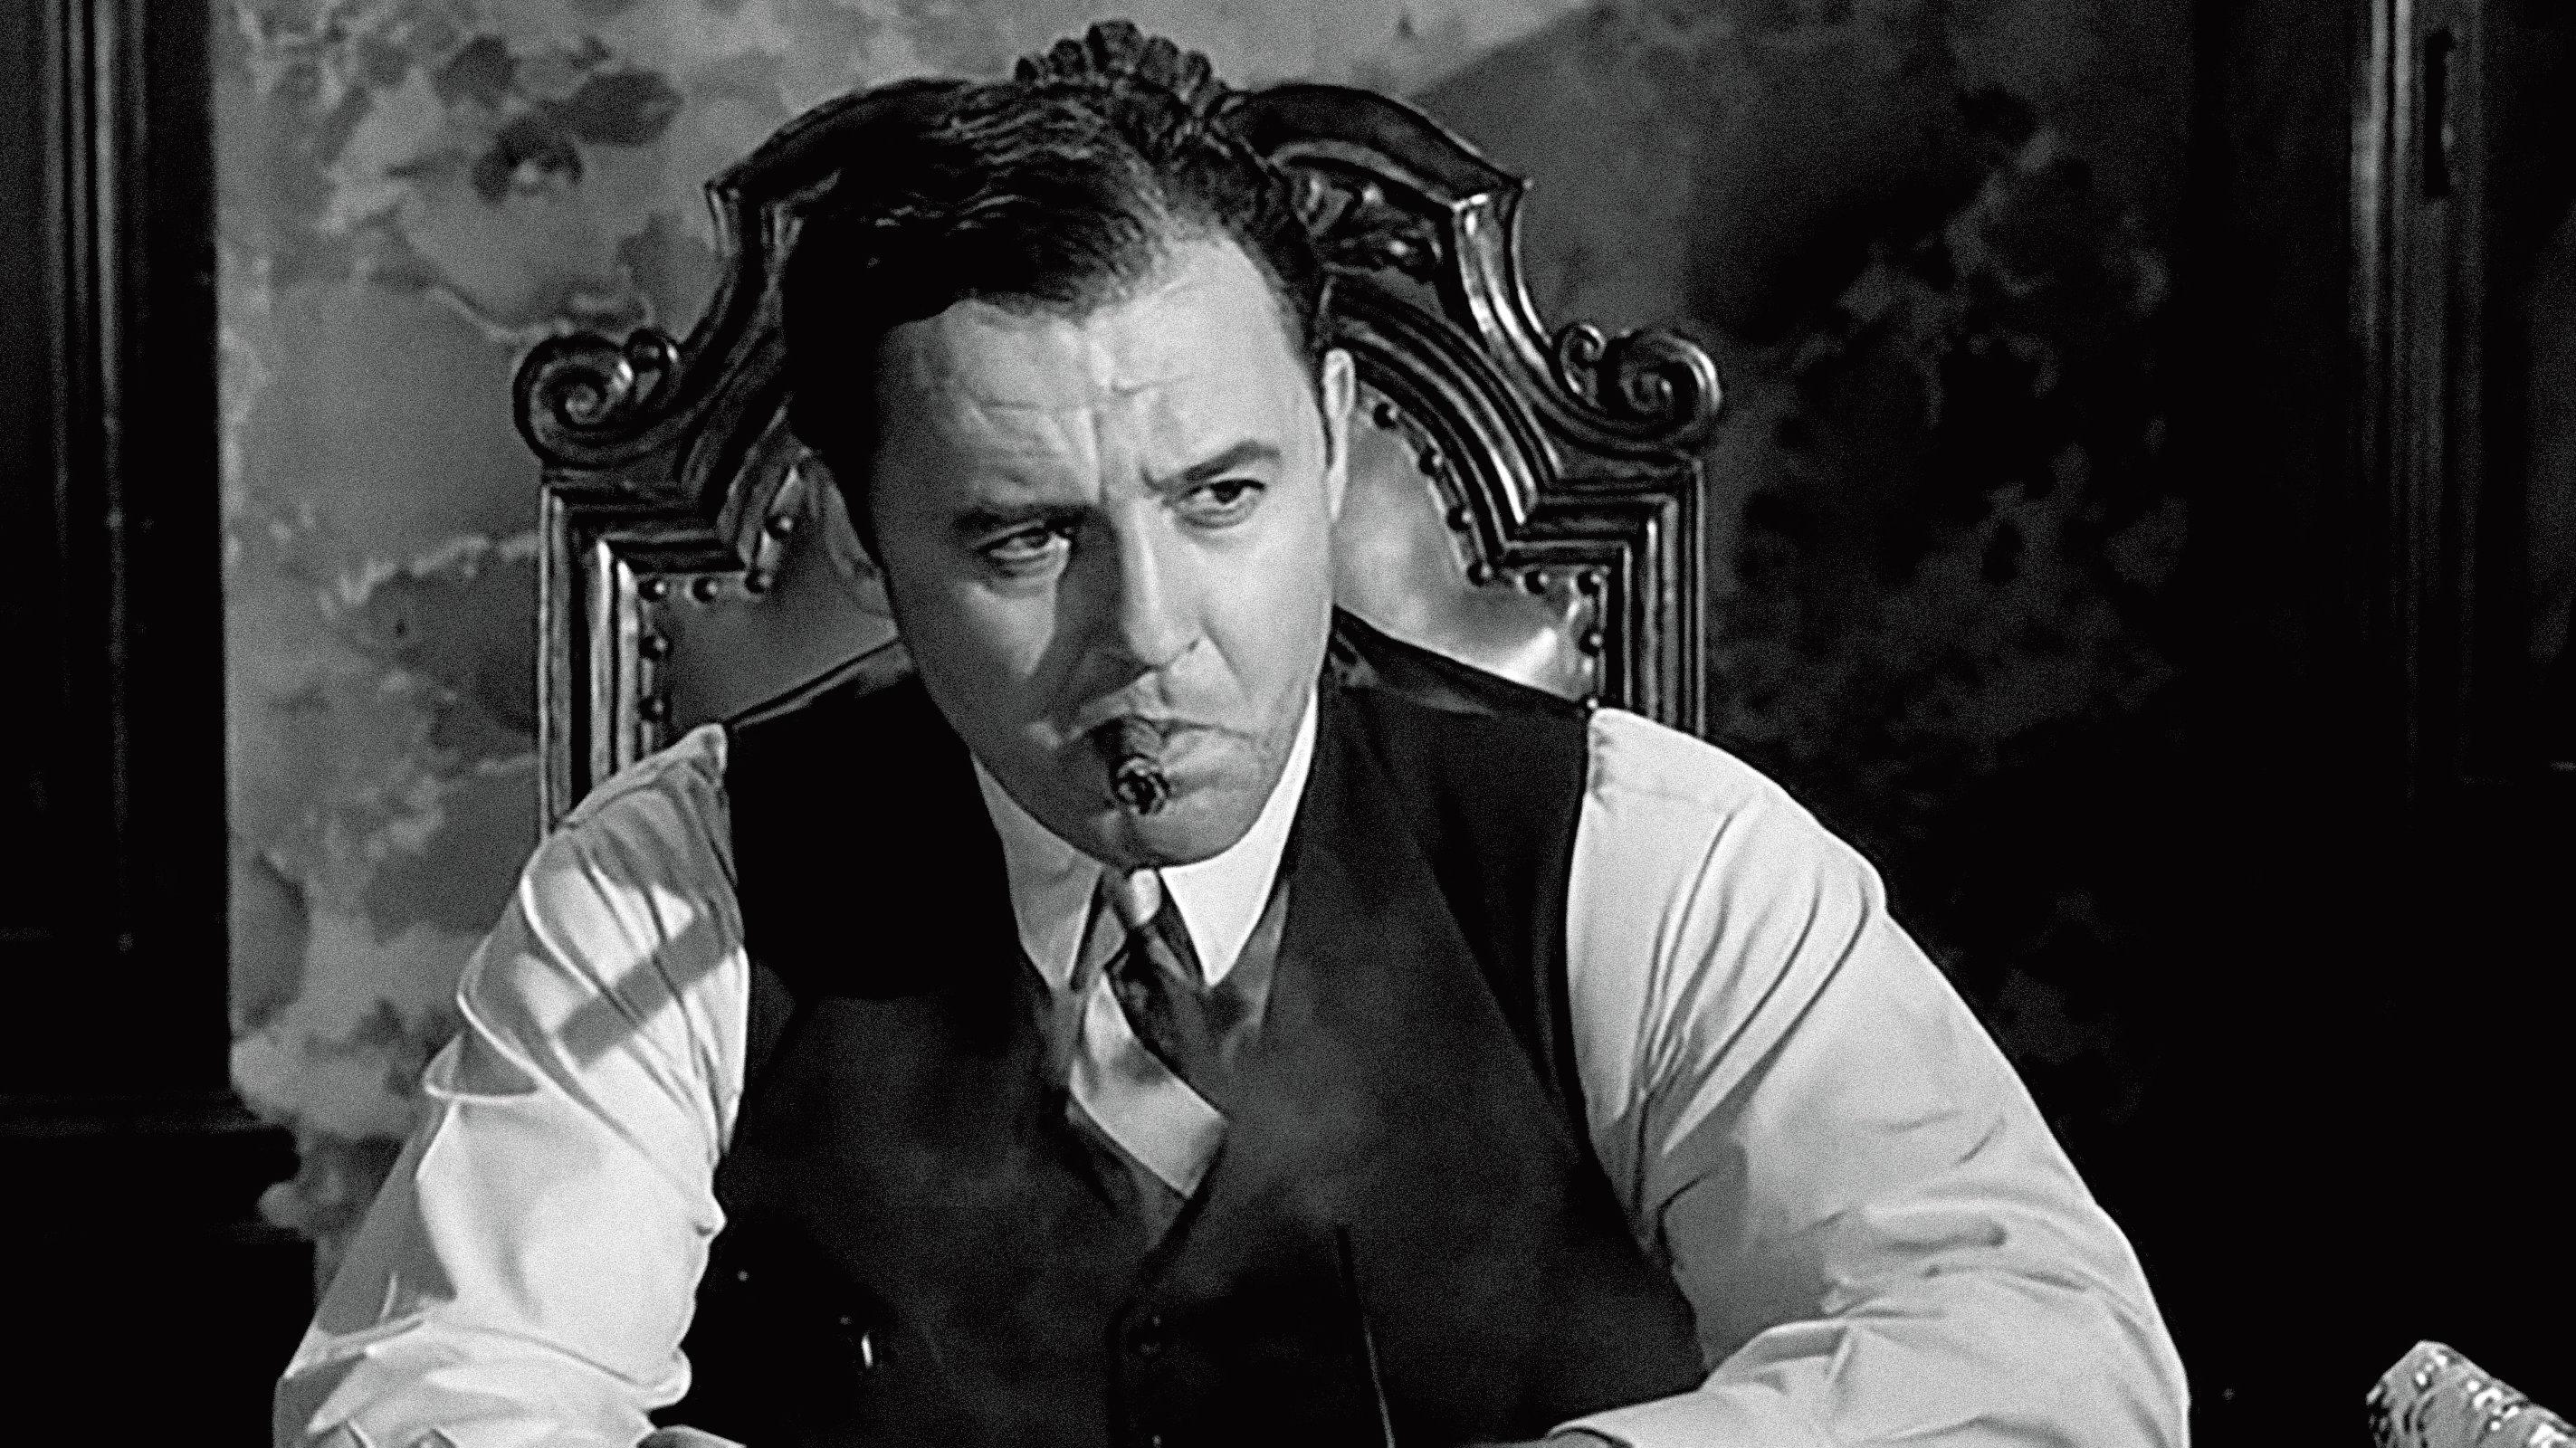 Rod Steiger in Al Capone, 1959